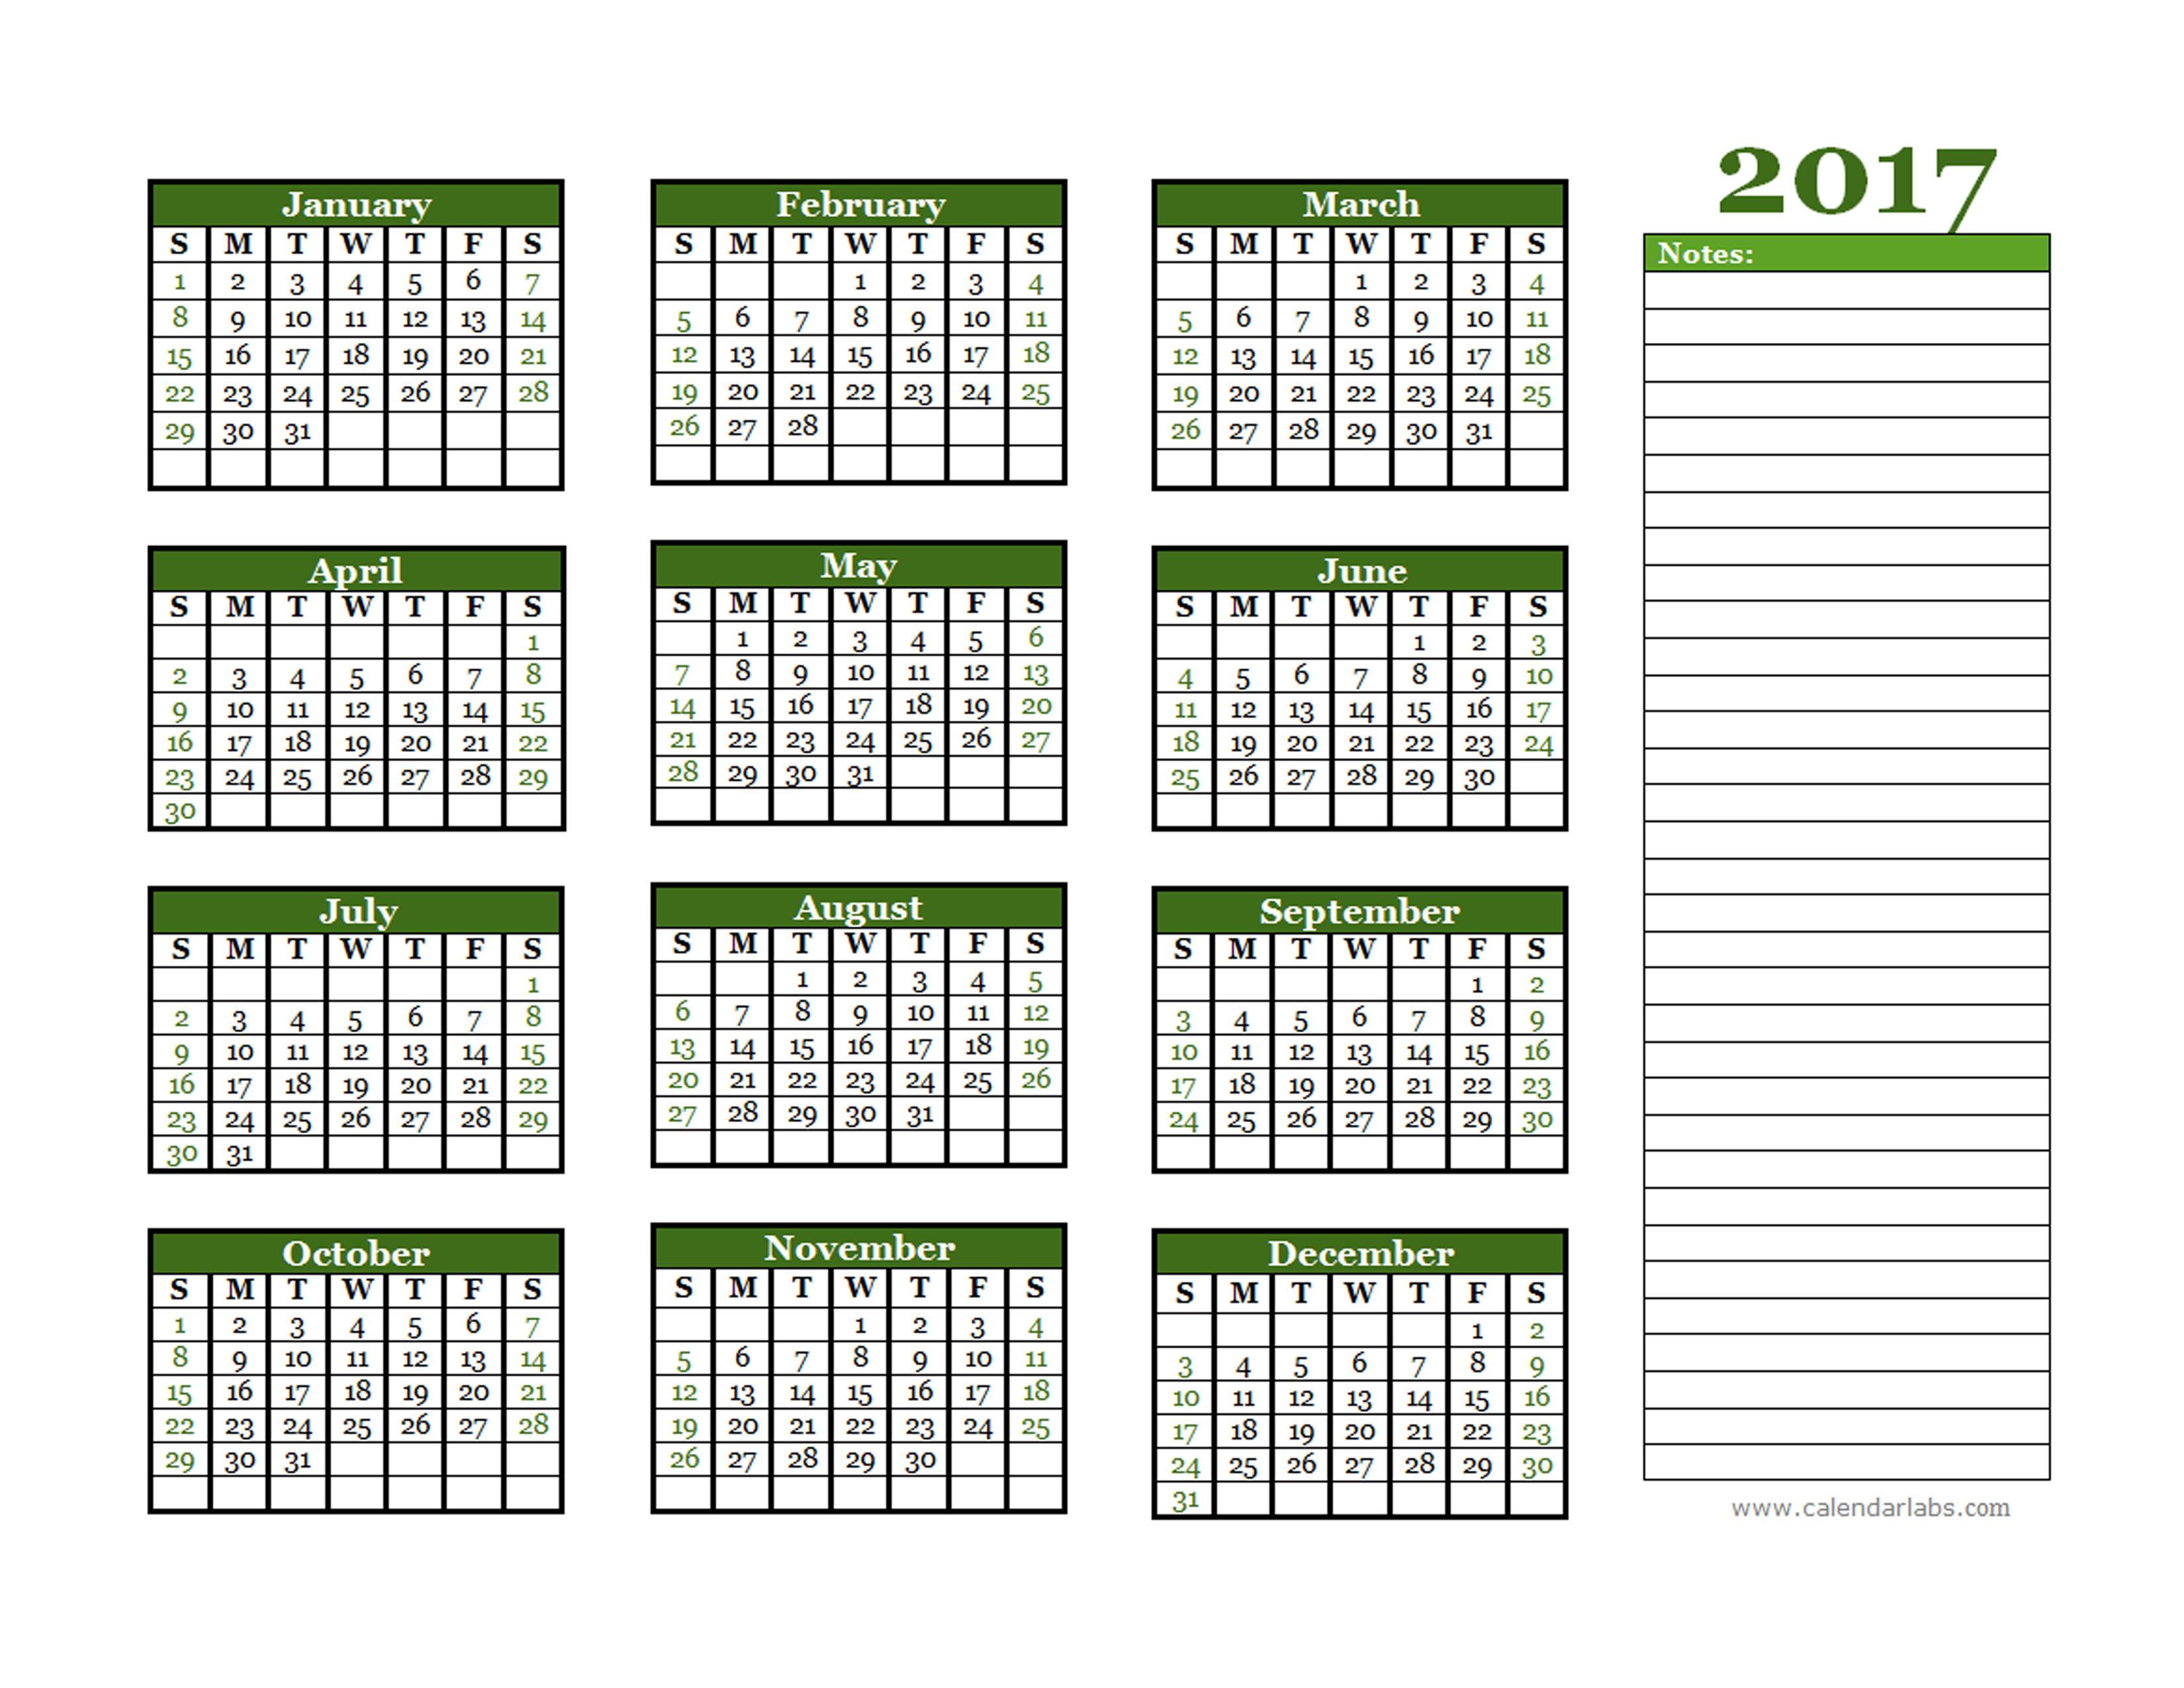 2017 Calendar Printable Free Pdf | Search Results | Calendar 2015